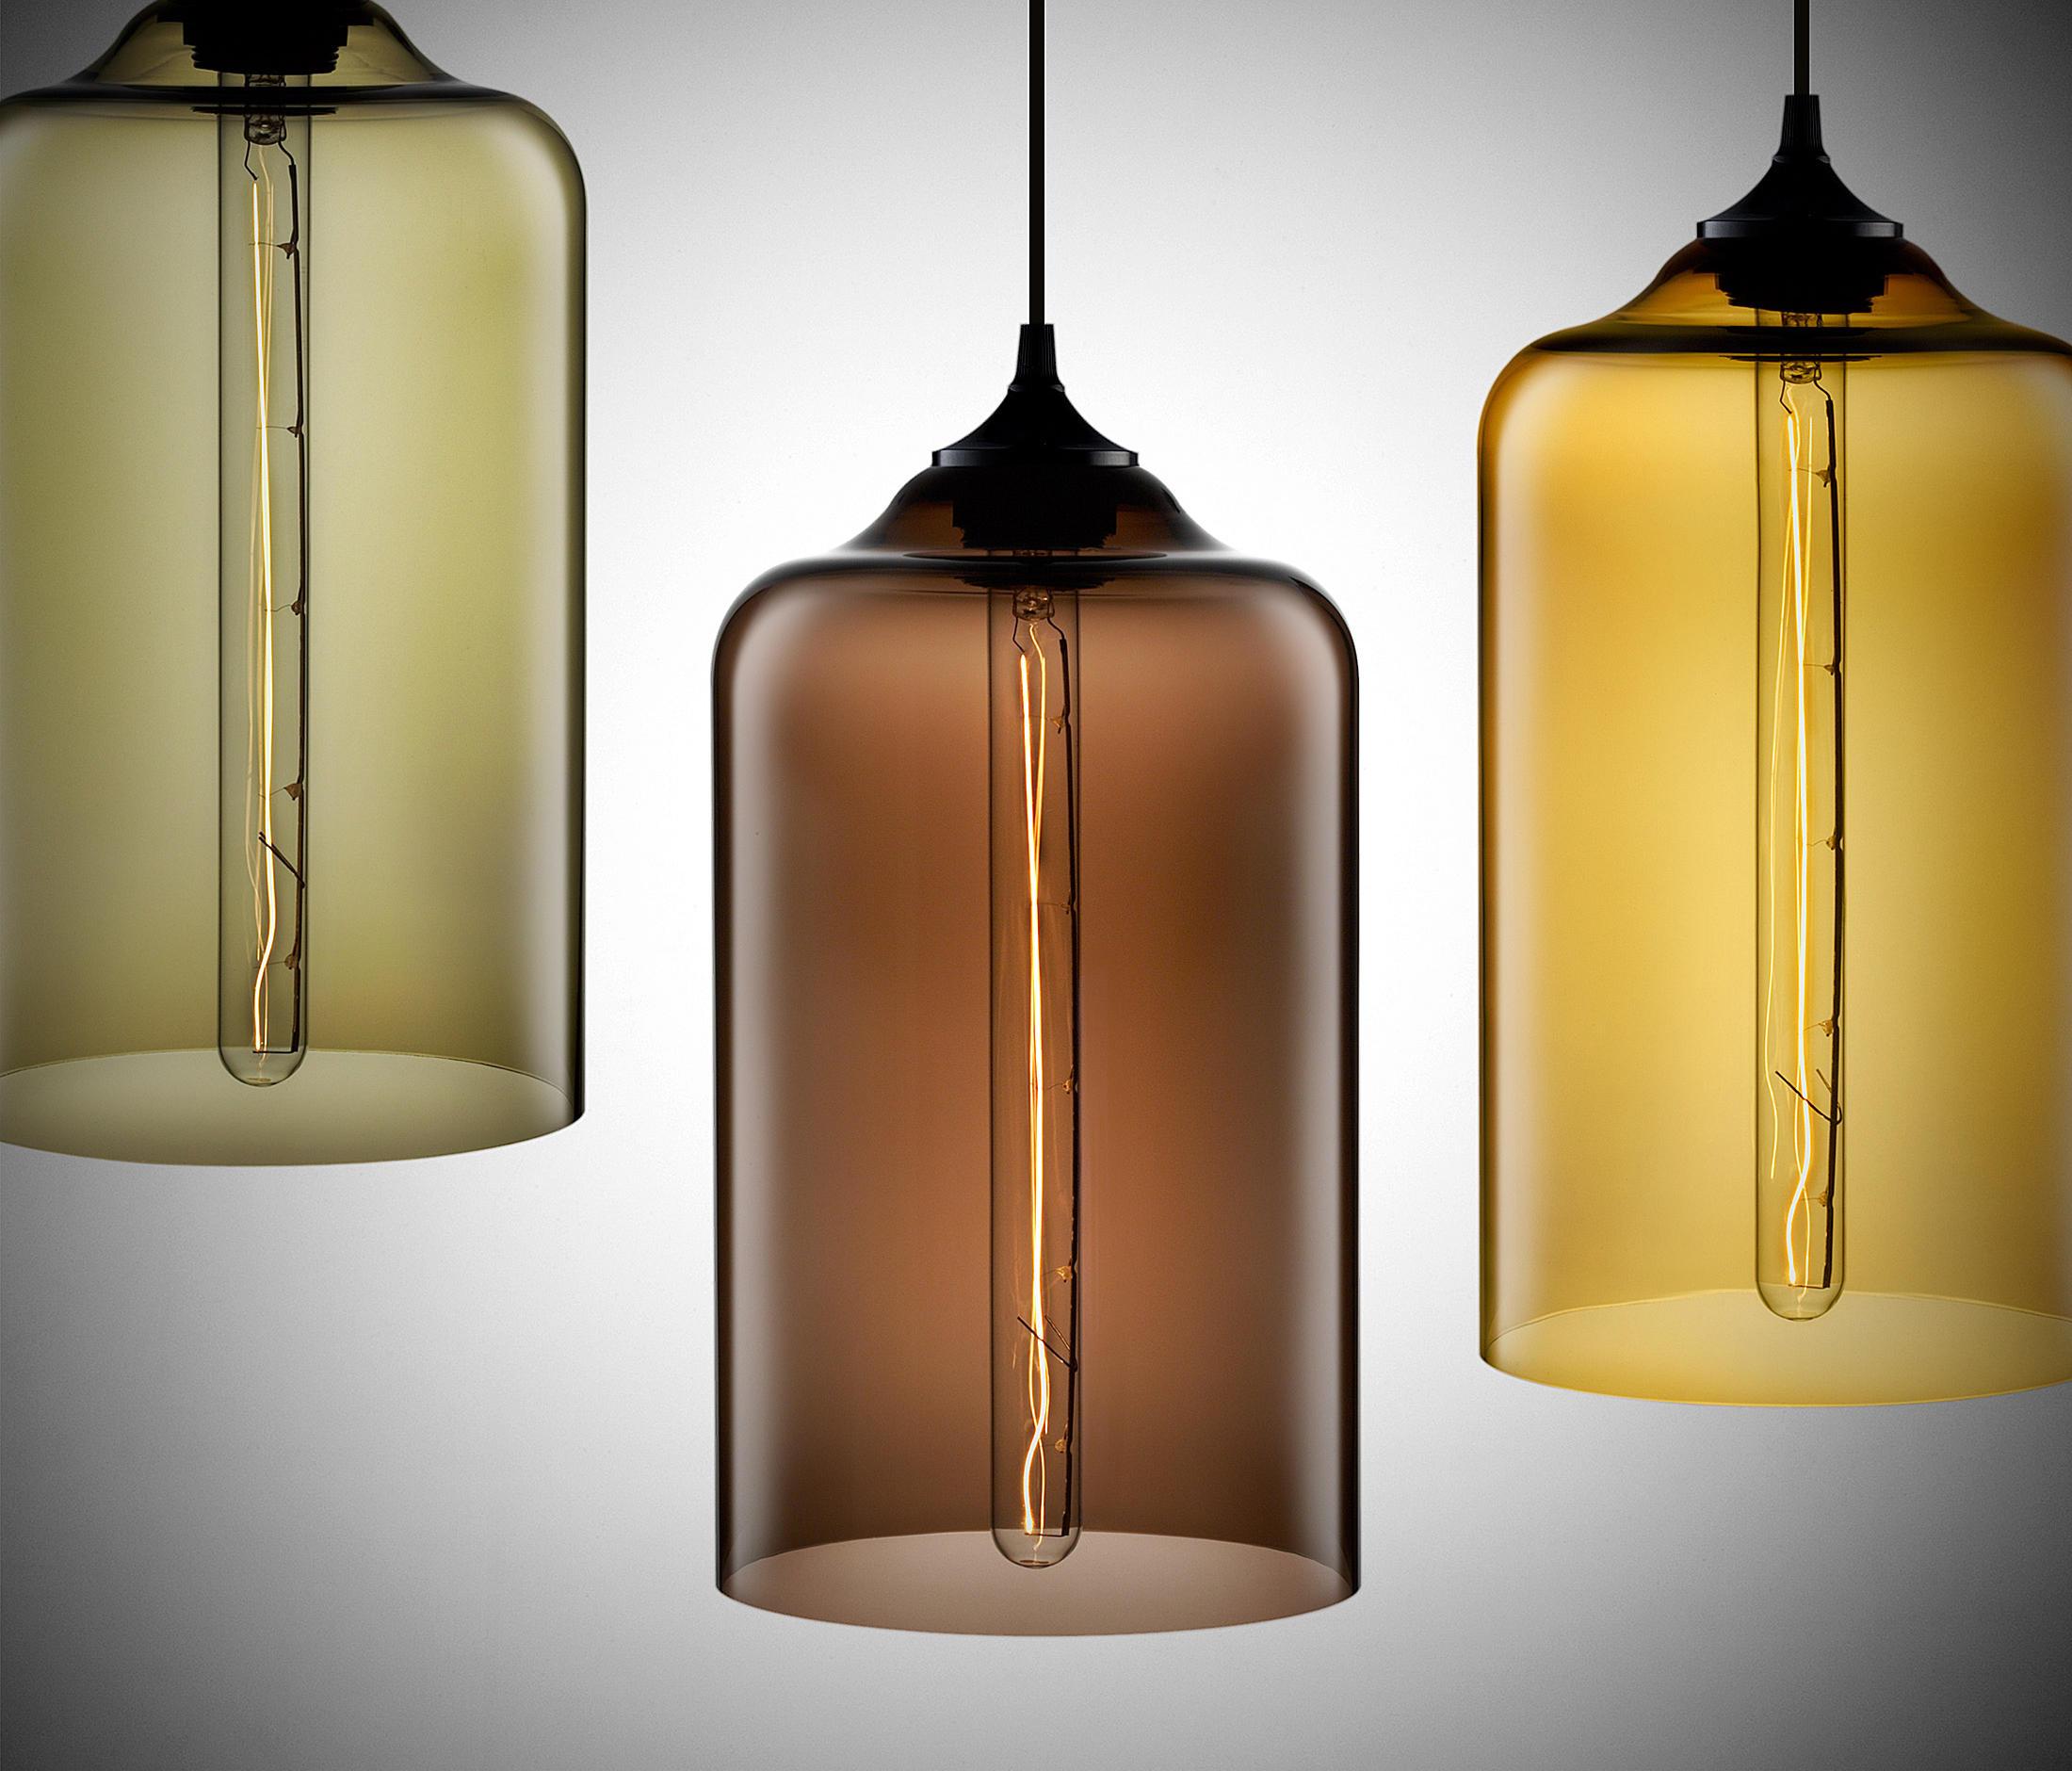 BELLA MODERN PENDANT LIGHT - Suspended lights from Niche ...